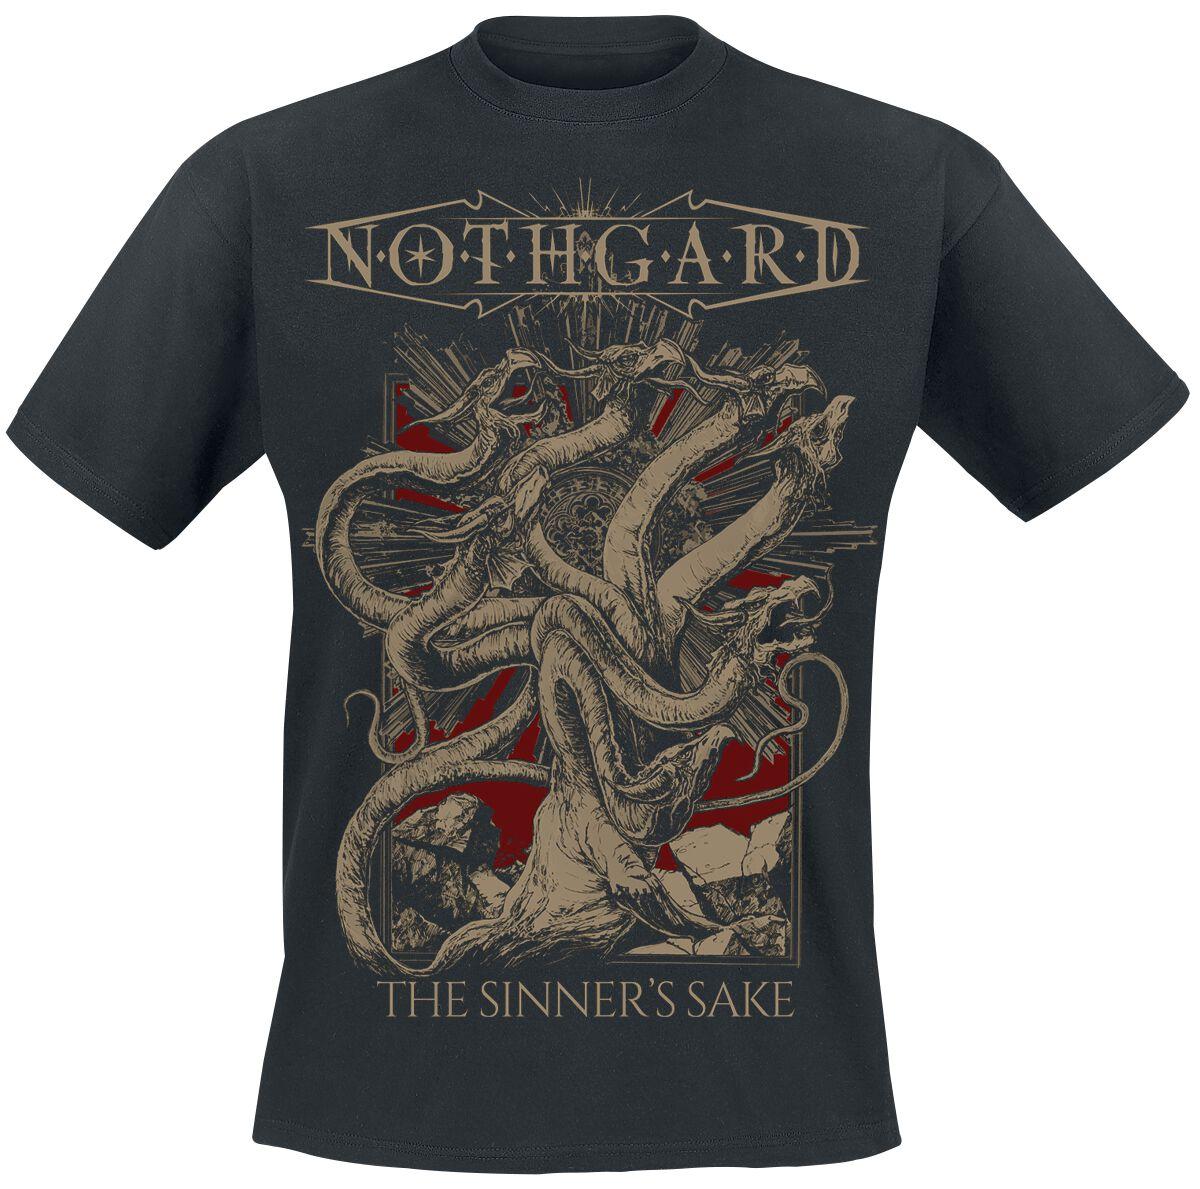 Zespoły - Koszulki - T-Shirt Nothgard The sinner's sake T-Shirt czarny - 359787